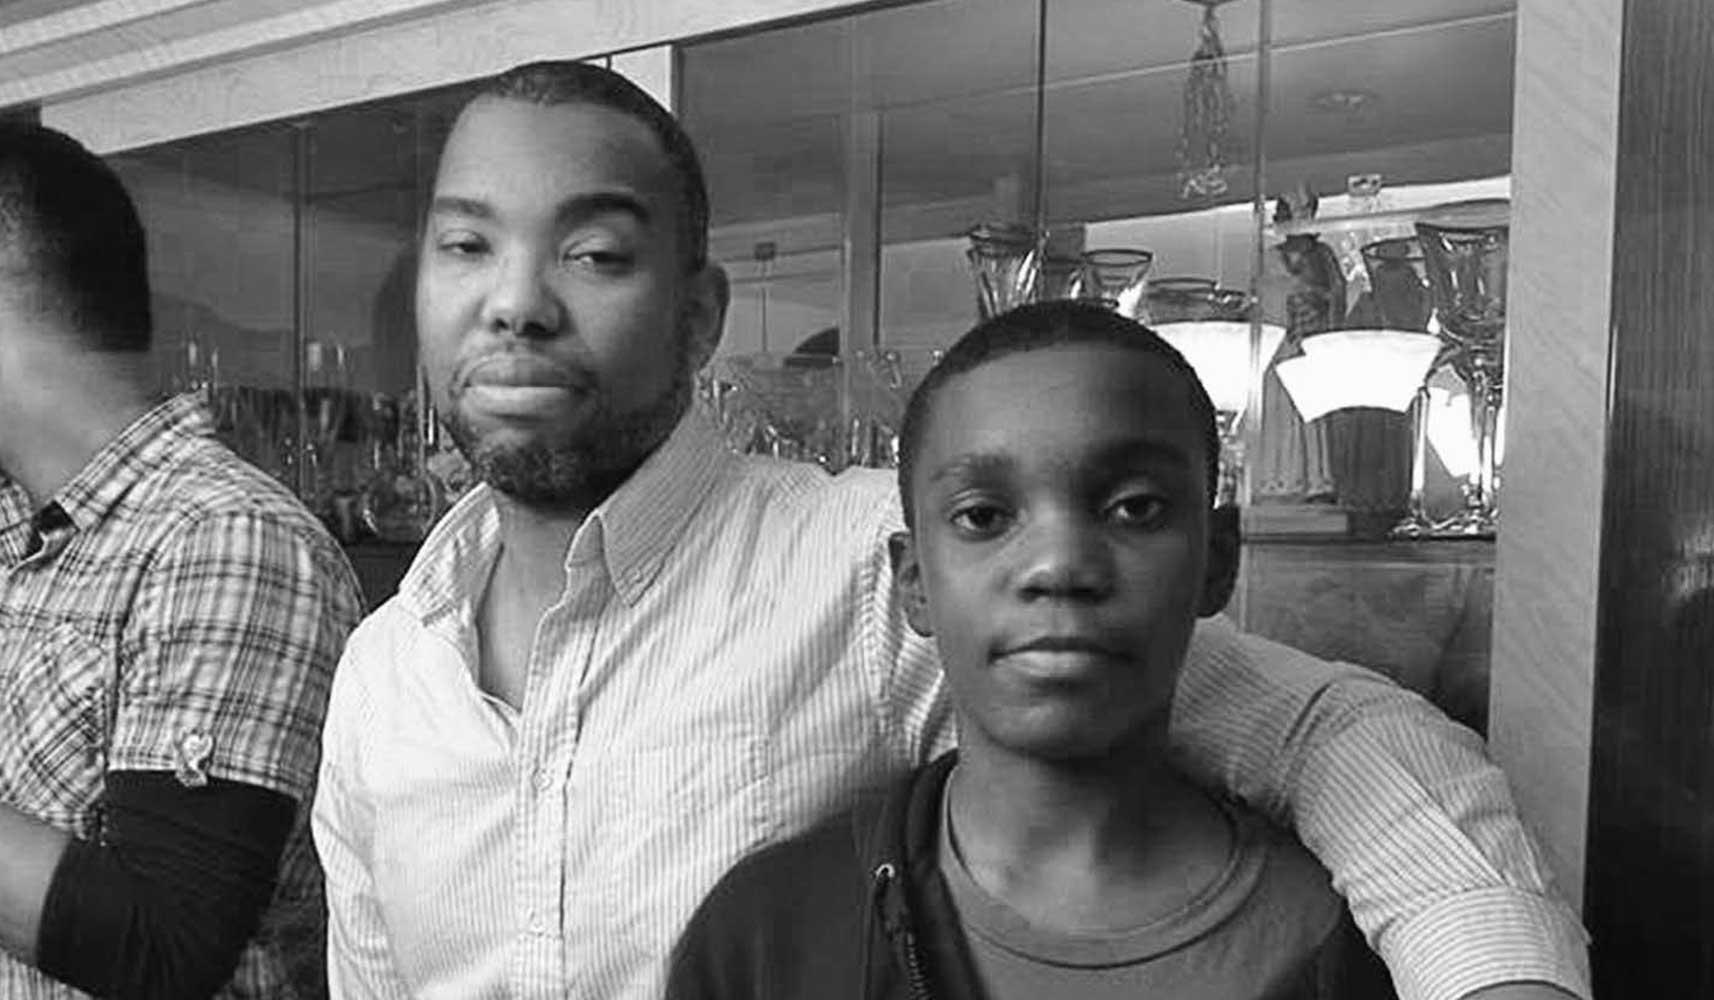 Ta-Nehisi Coates and his son, Samori.